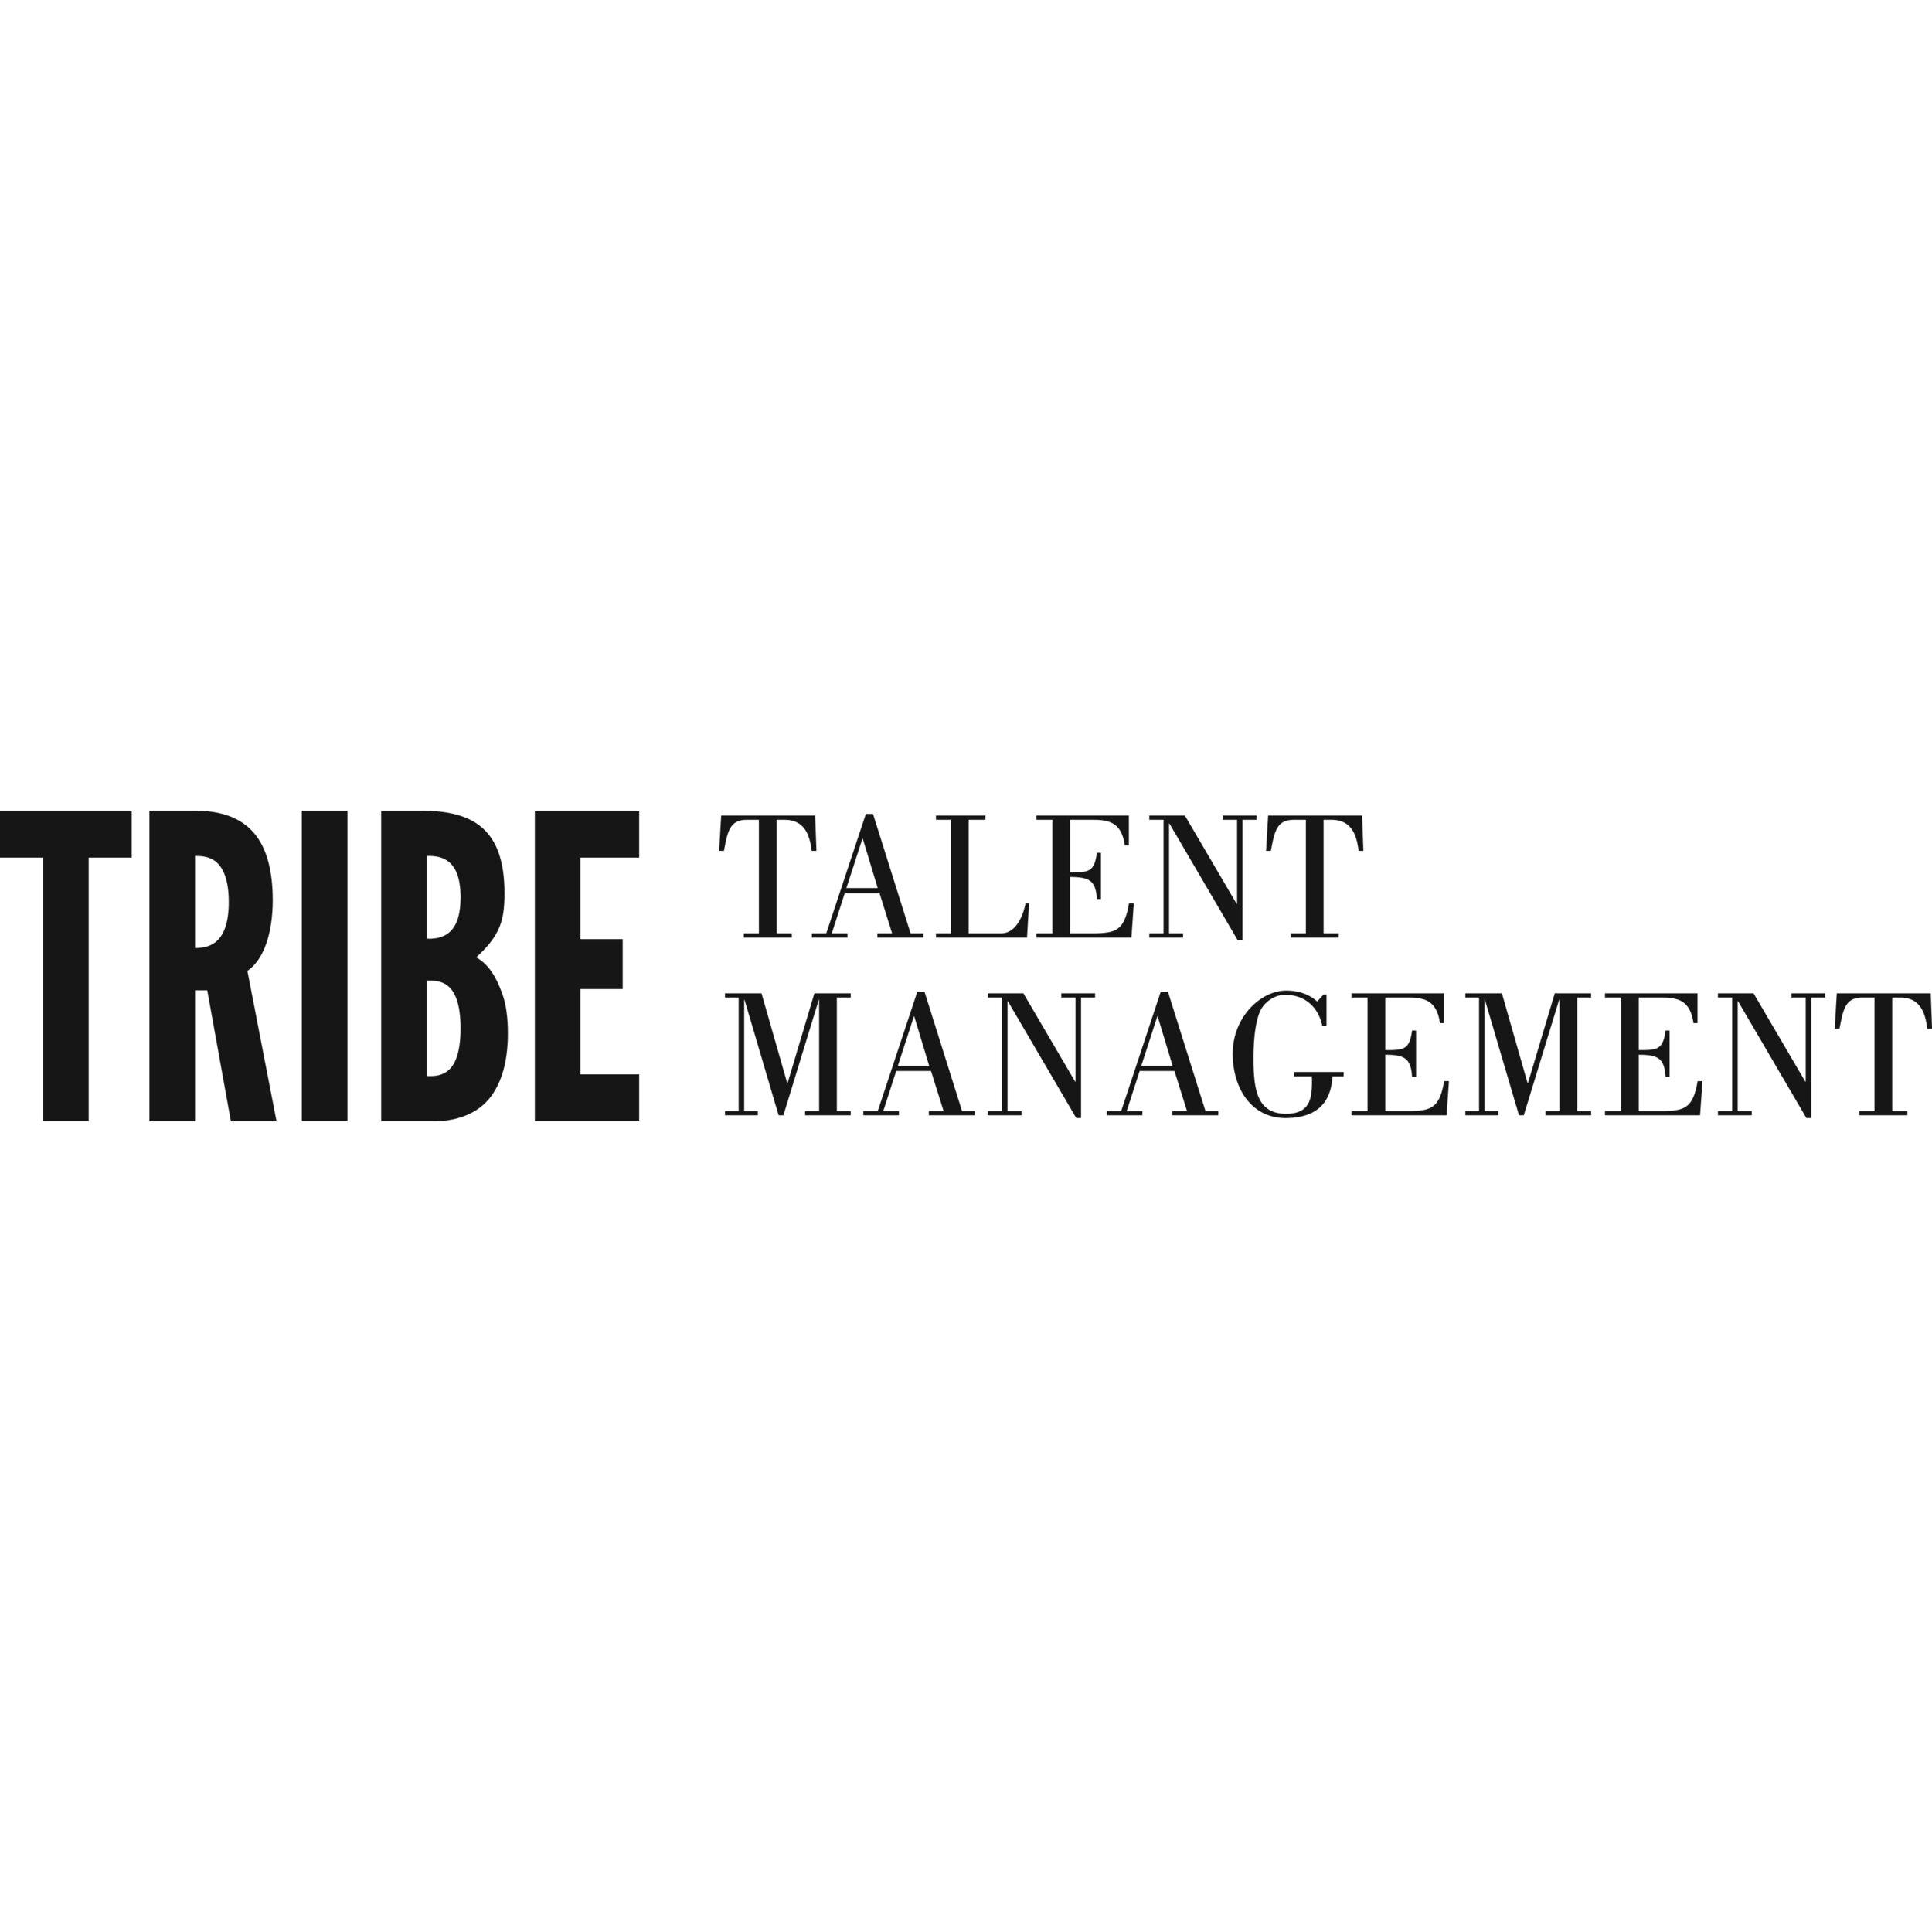 Tribe_TalentManagement_TypeTreatment